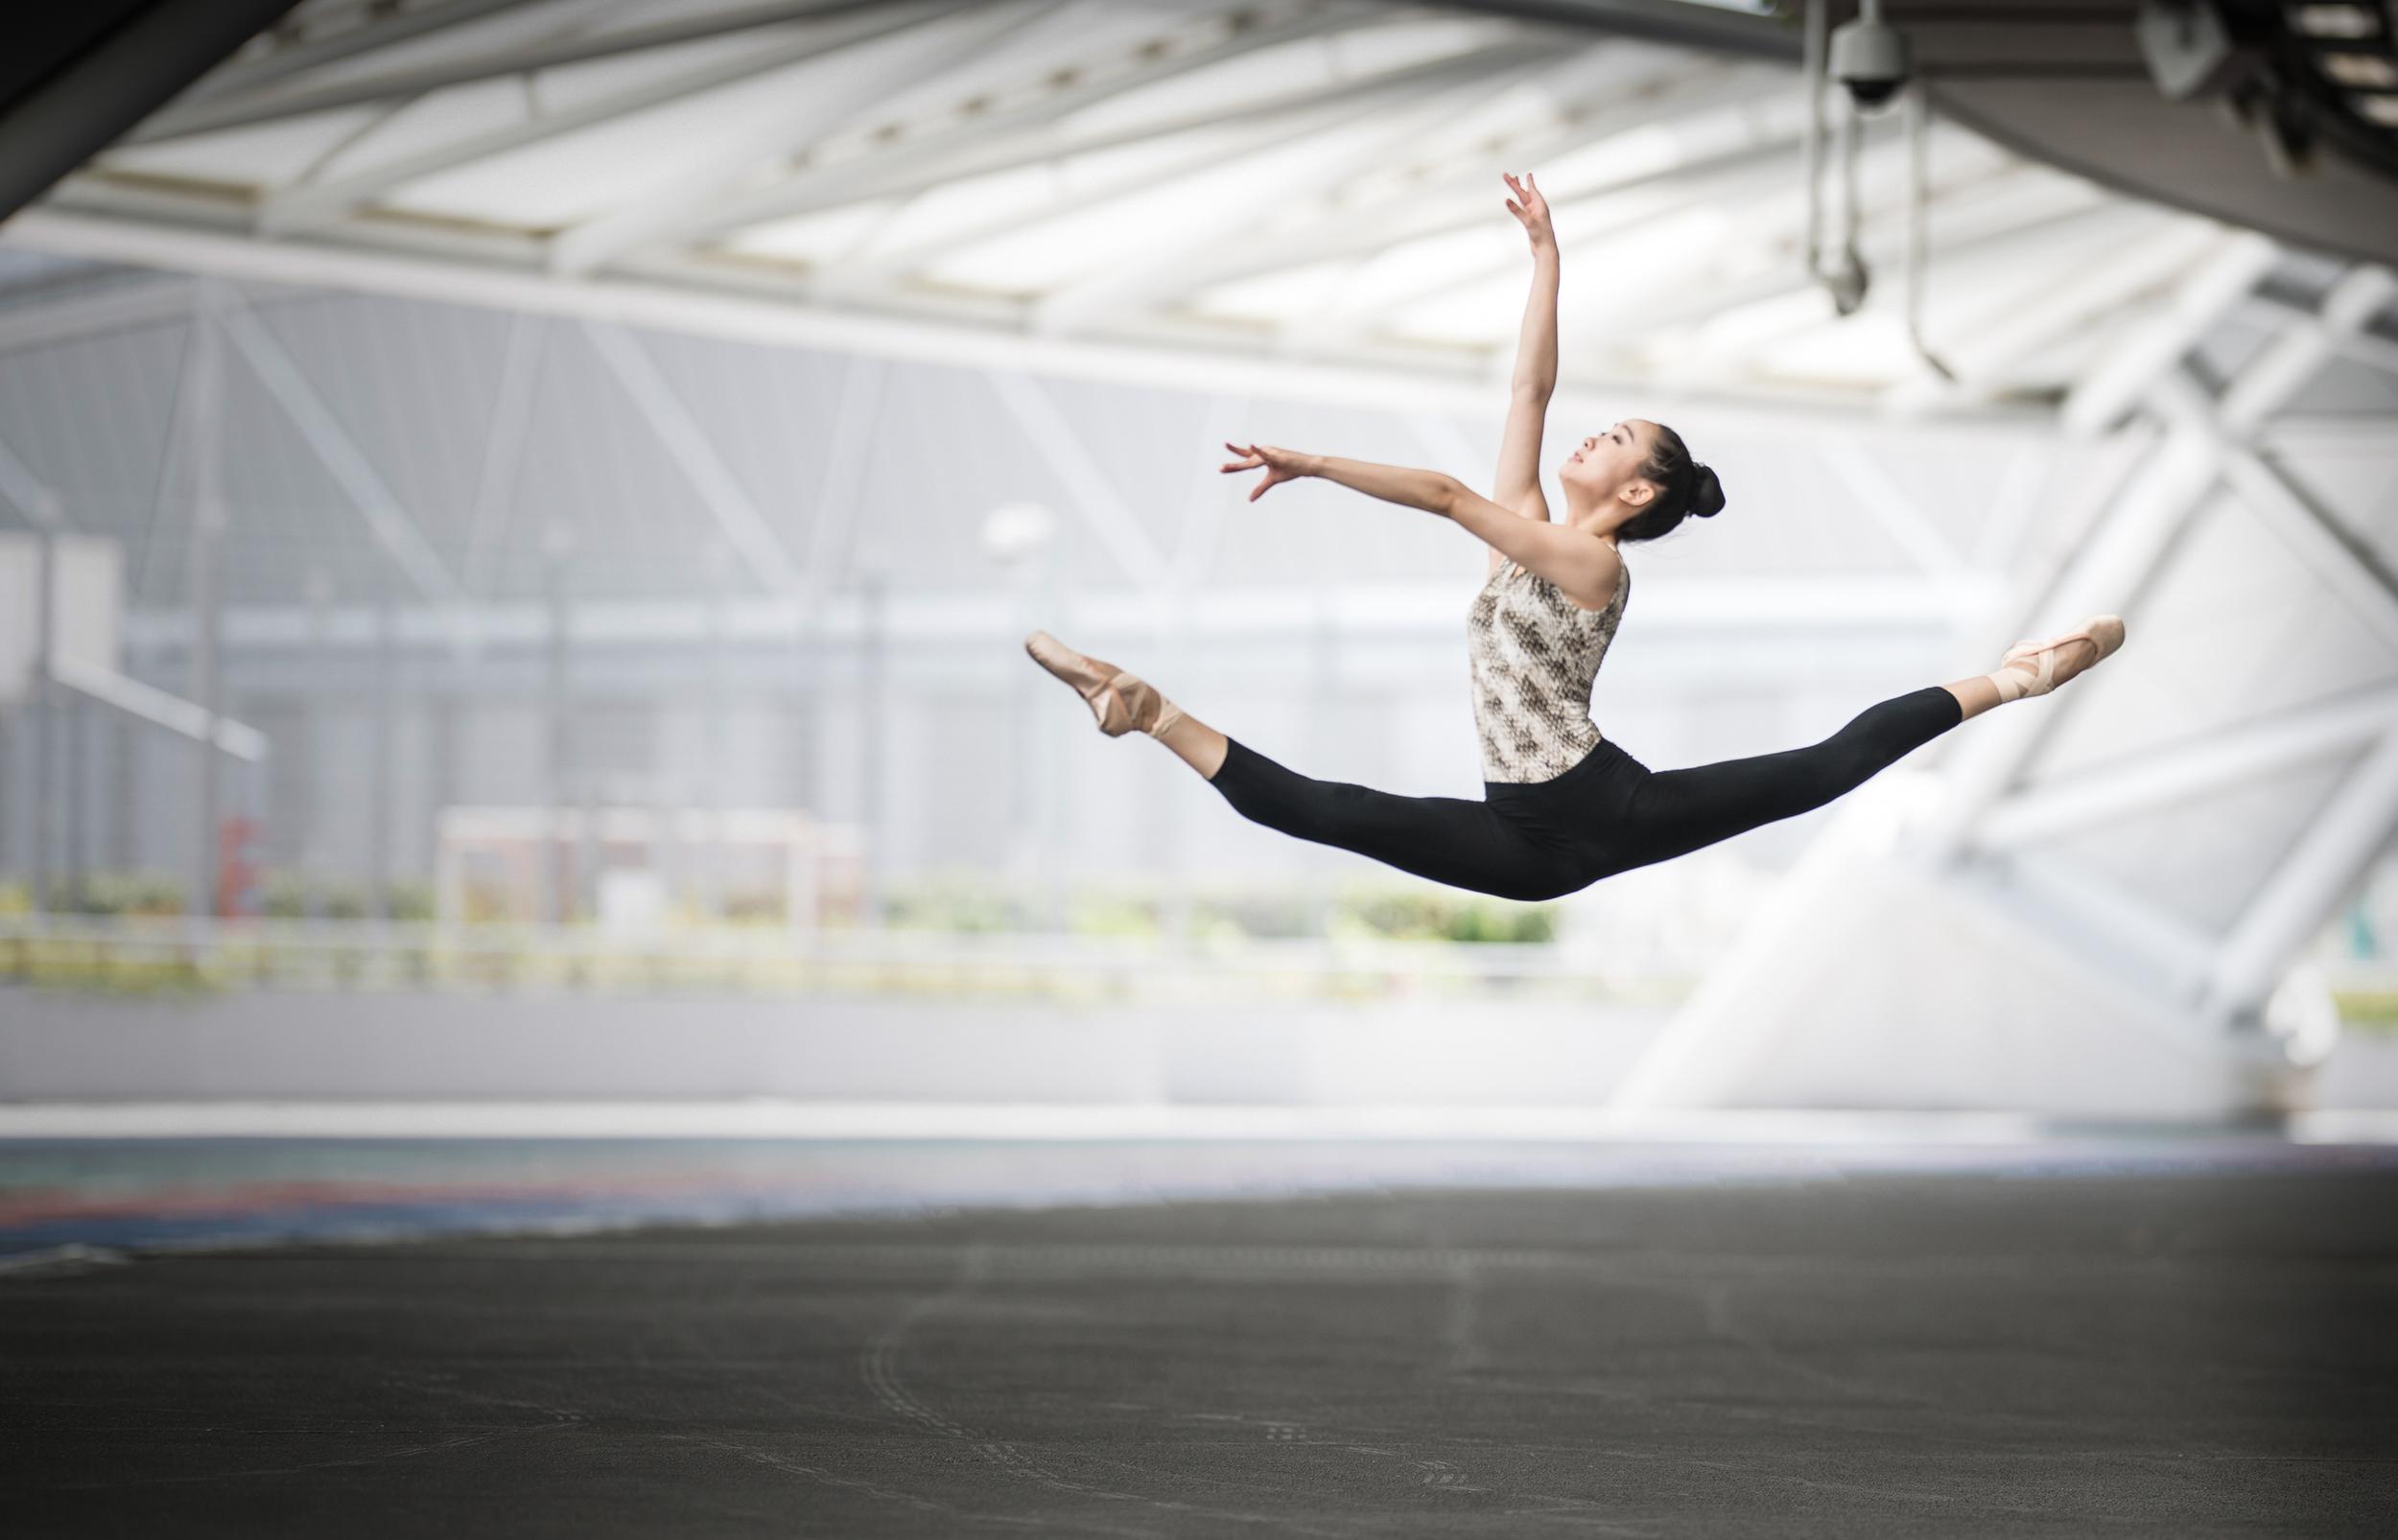 Wang Wen Wen with Balletlove.co